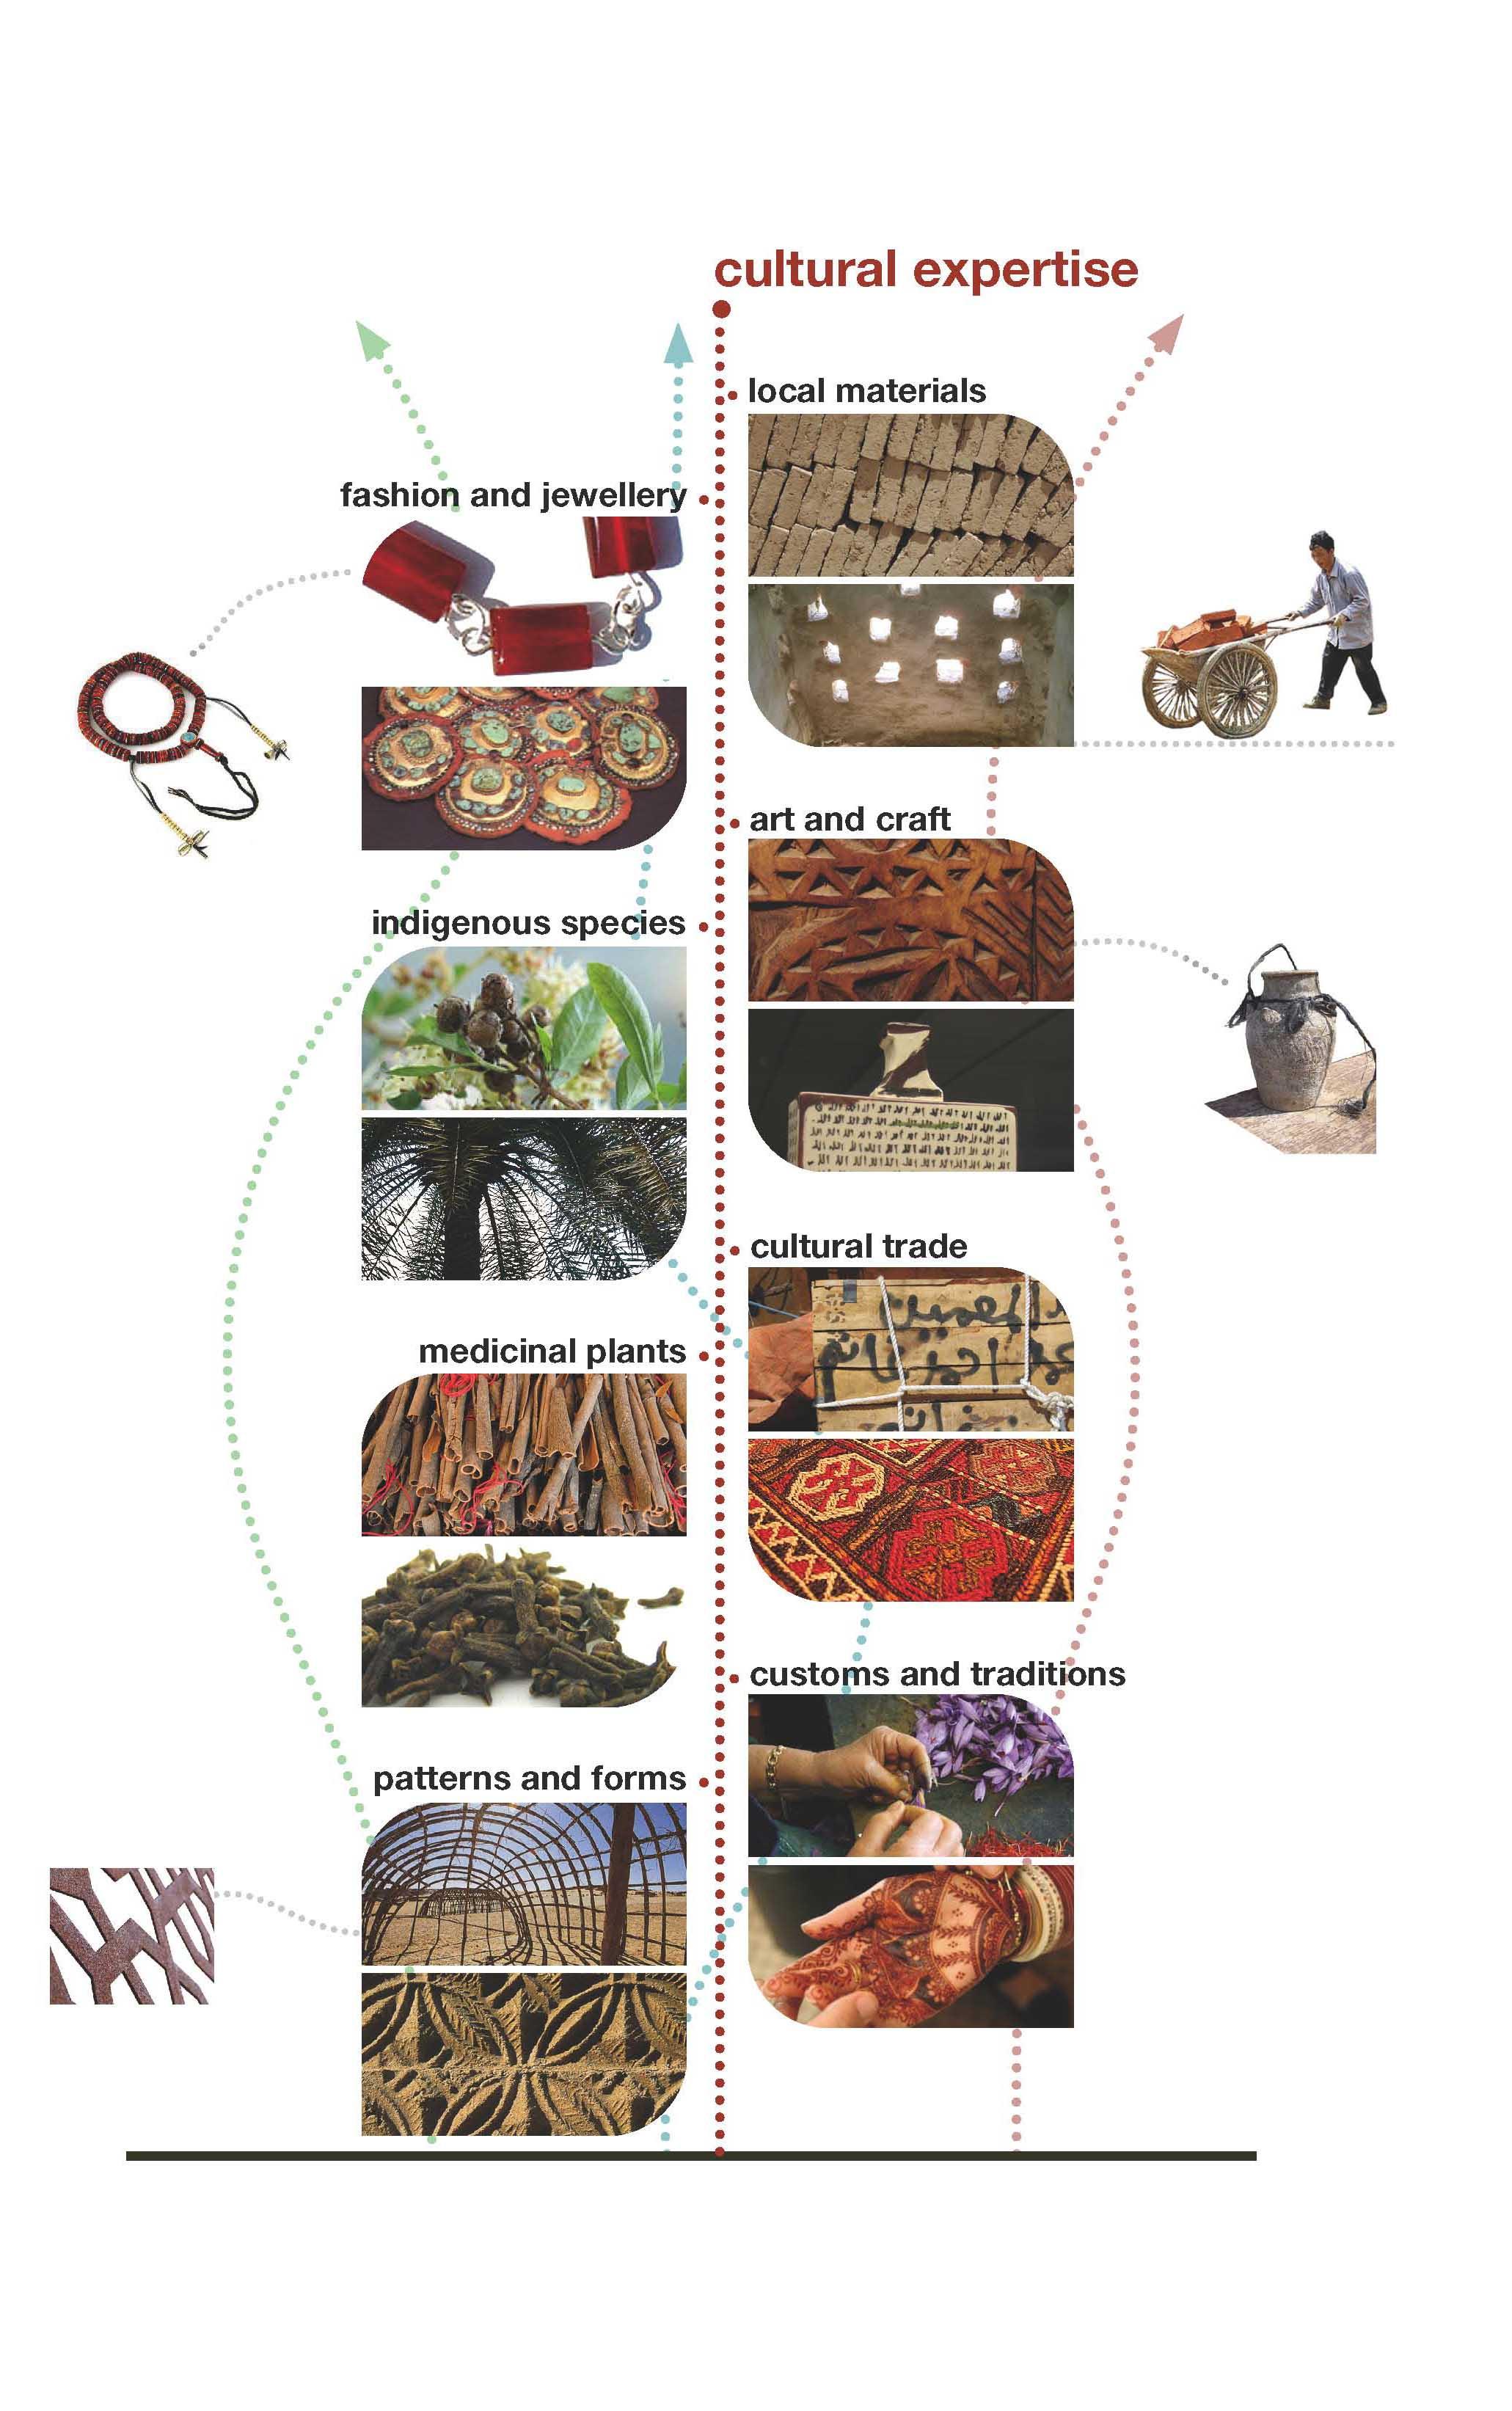 Coe Design brochure - Cultural expertise cropped.jpg